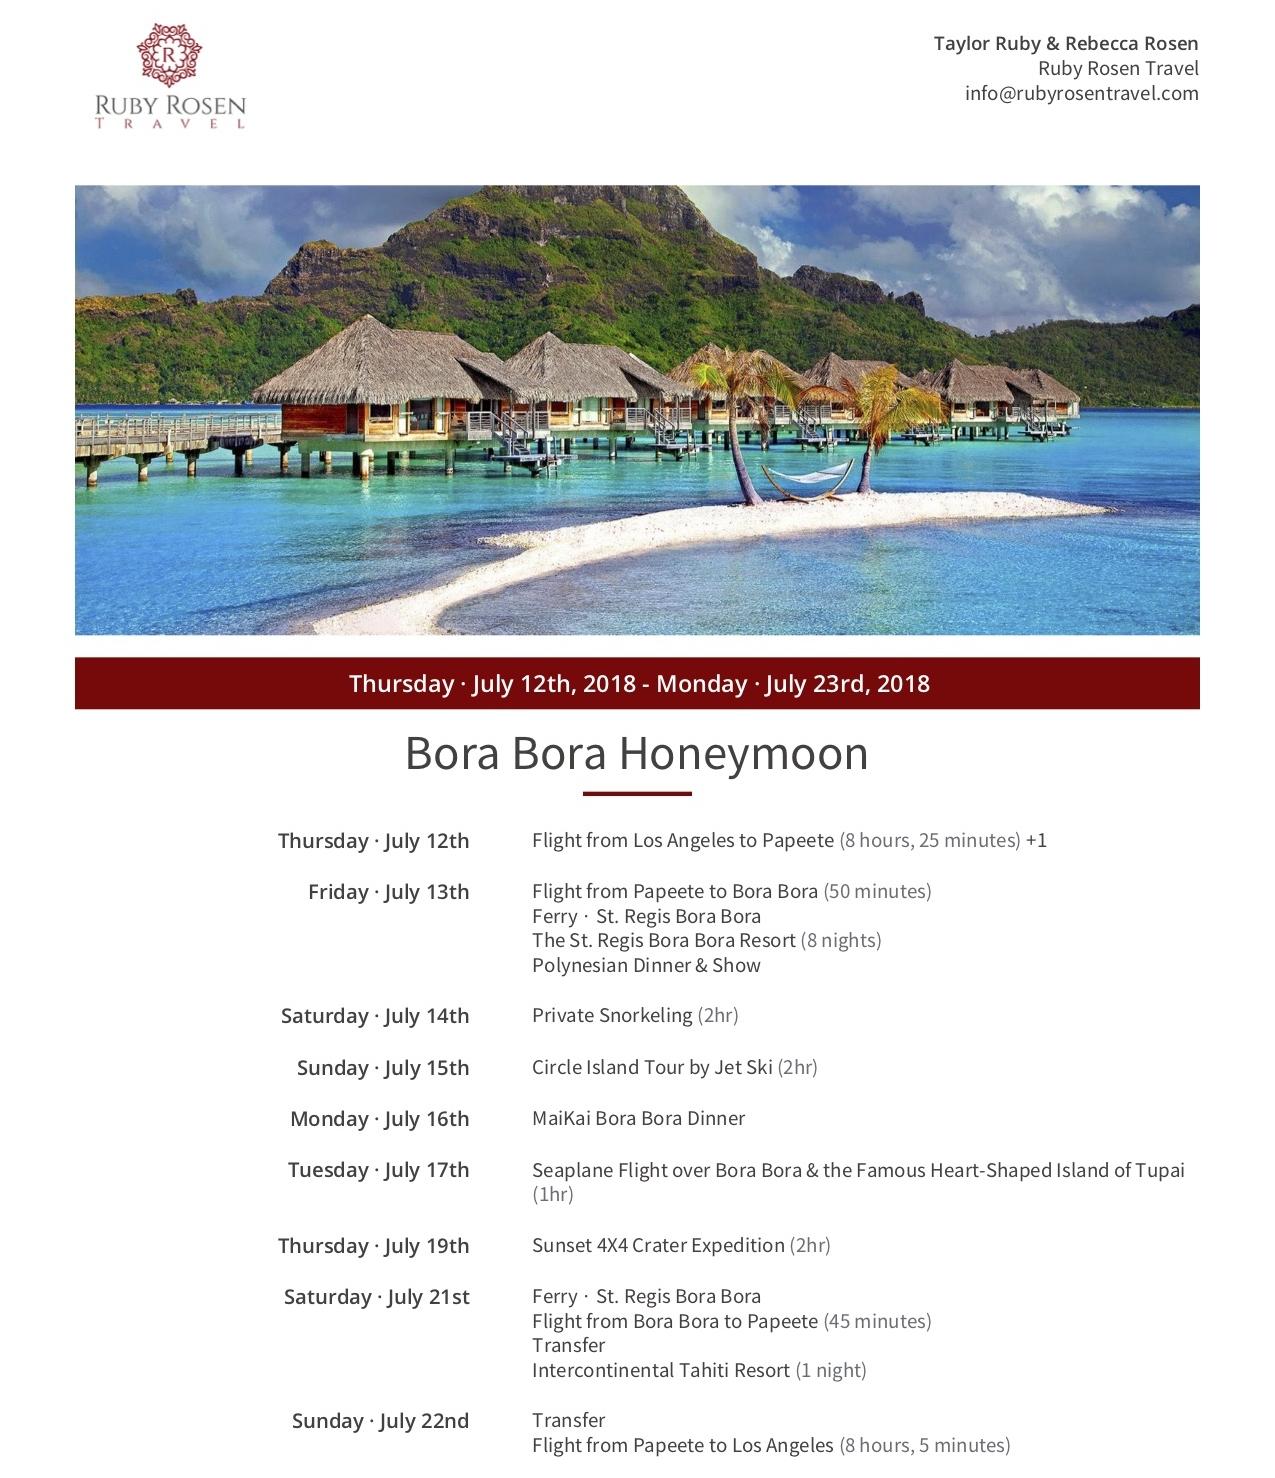 Bora Bora Honeymoon 1.jpg